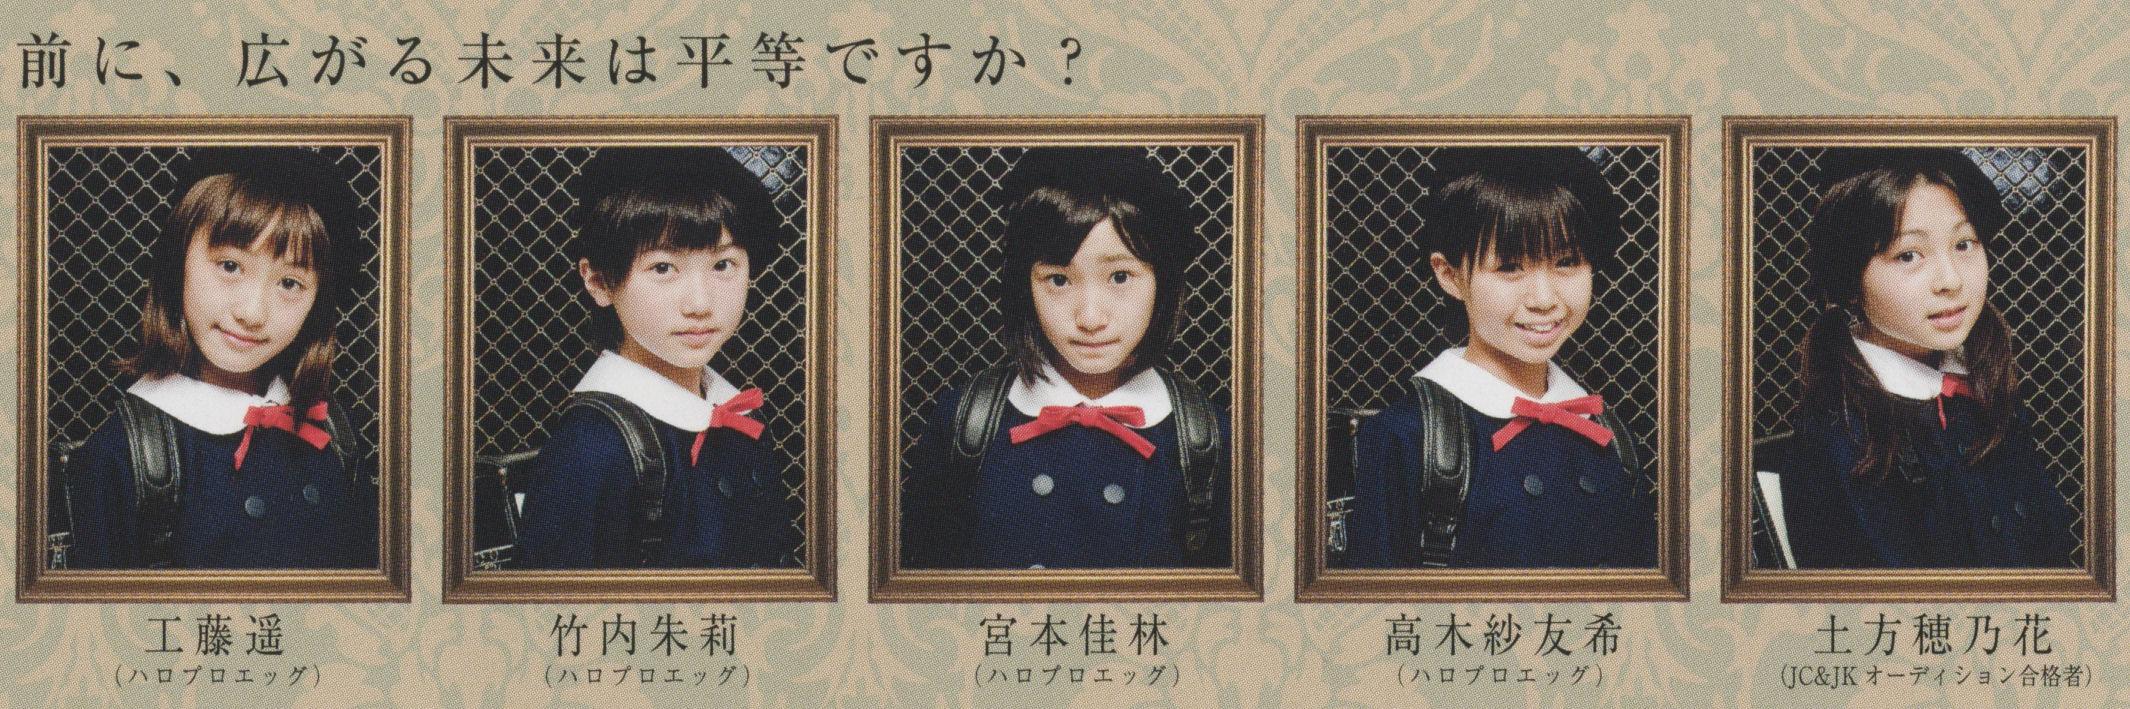 Twitter「宮本さんと稲場さんの演技はもう鞘師と工藤レベルに達している」 YouTube動画>4本 ->画像>23枚